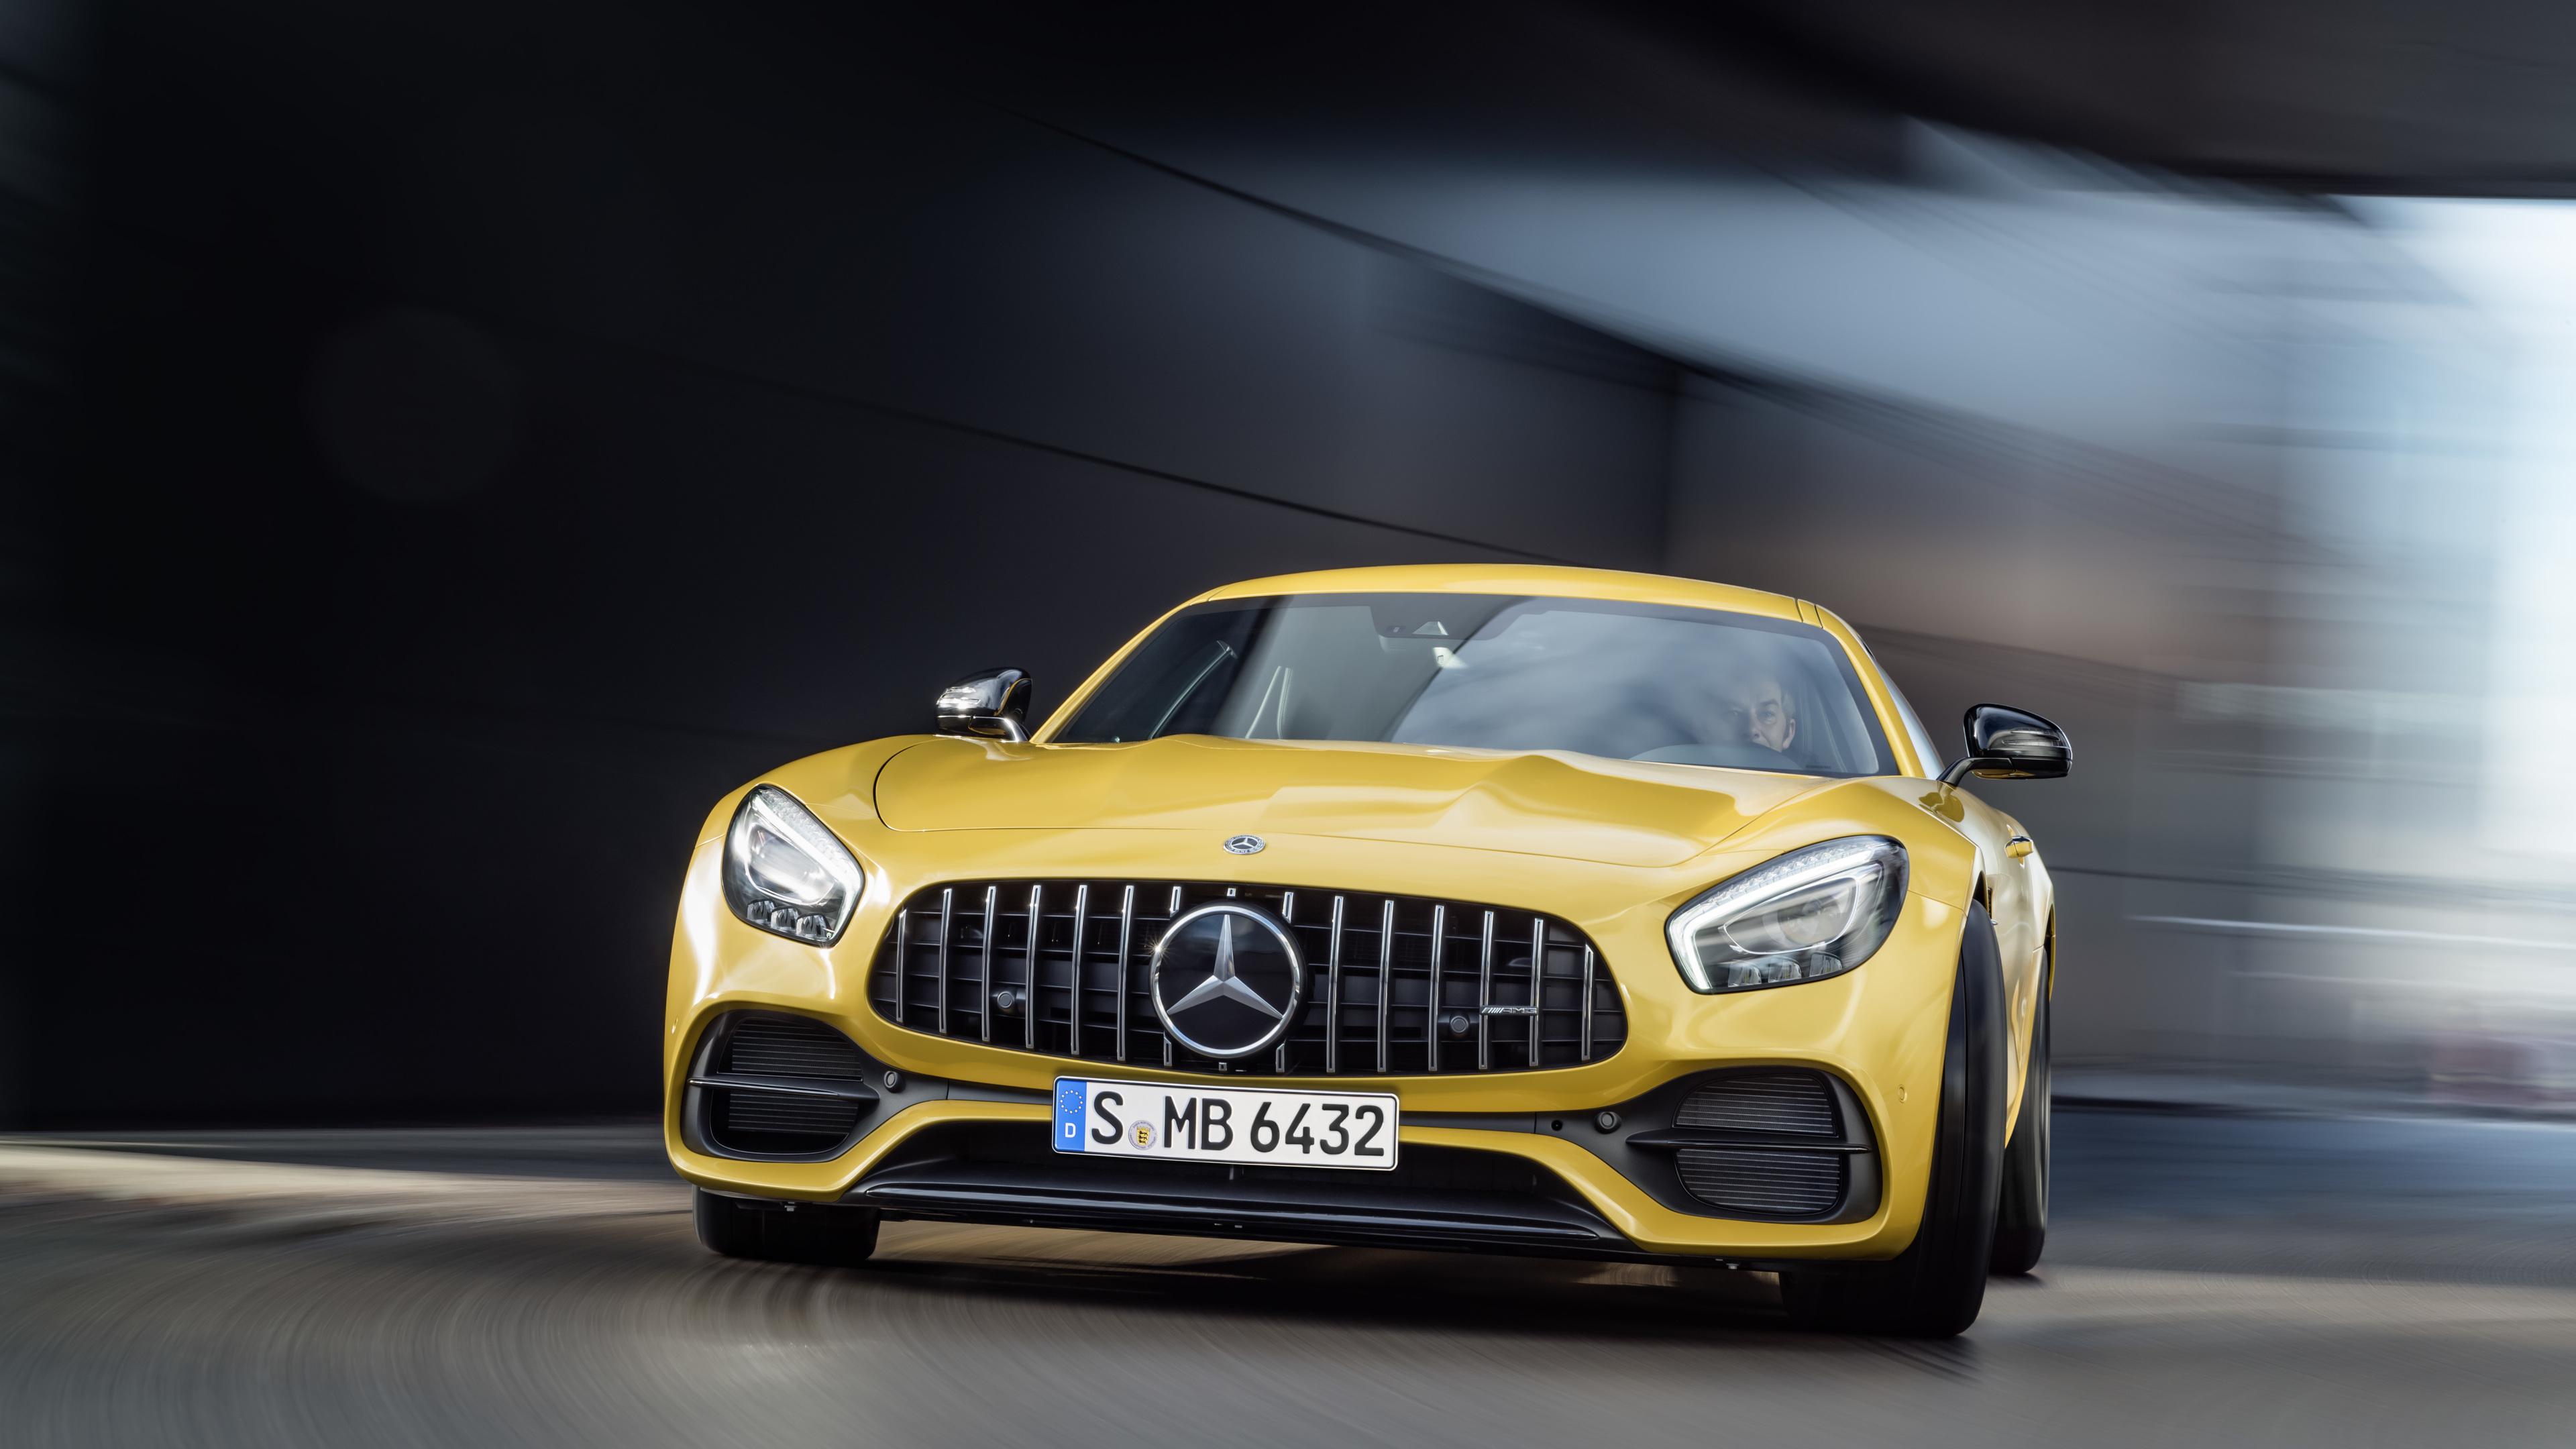 mercedes benz amg gt 2018 1539104932 - Mercedes Benz AMG GT 2018 - yellow wallpapers, mercedes wallpapers, mercedes benz wallpapers, cars wallpapers, amg wallpapers, 8k wallpapers, 2018 cars wallpapers